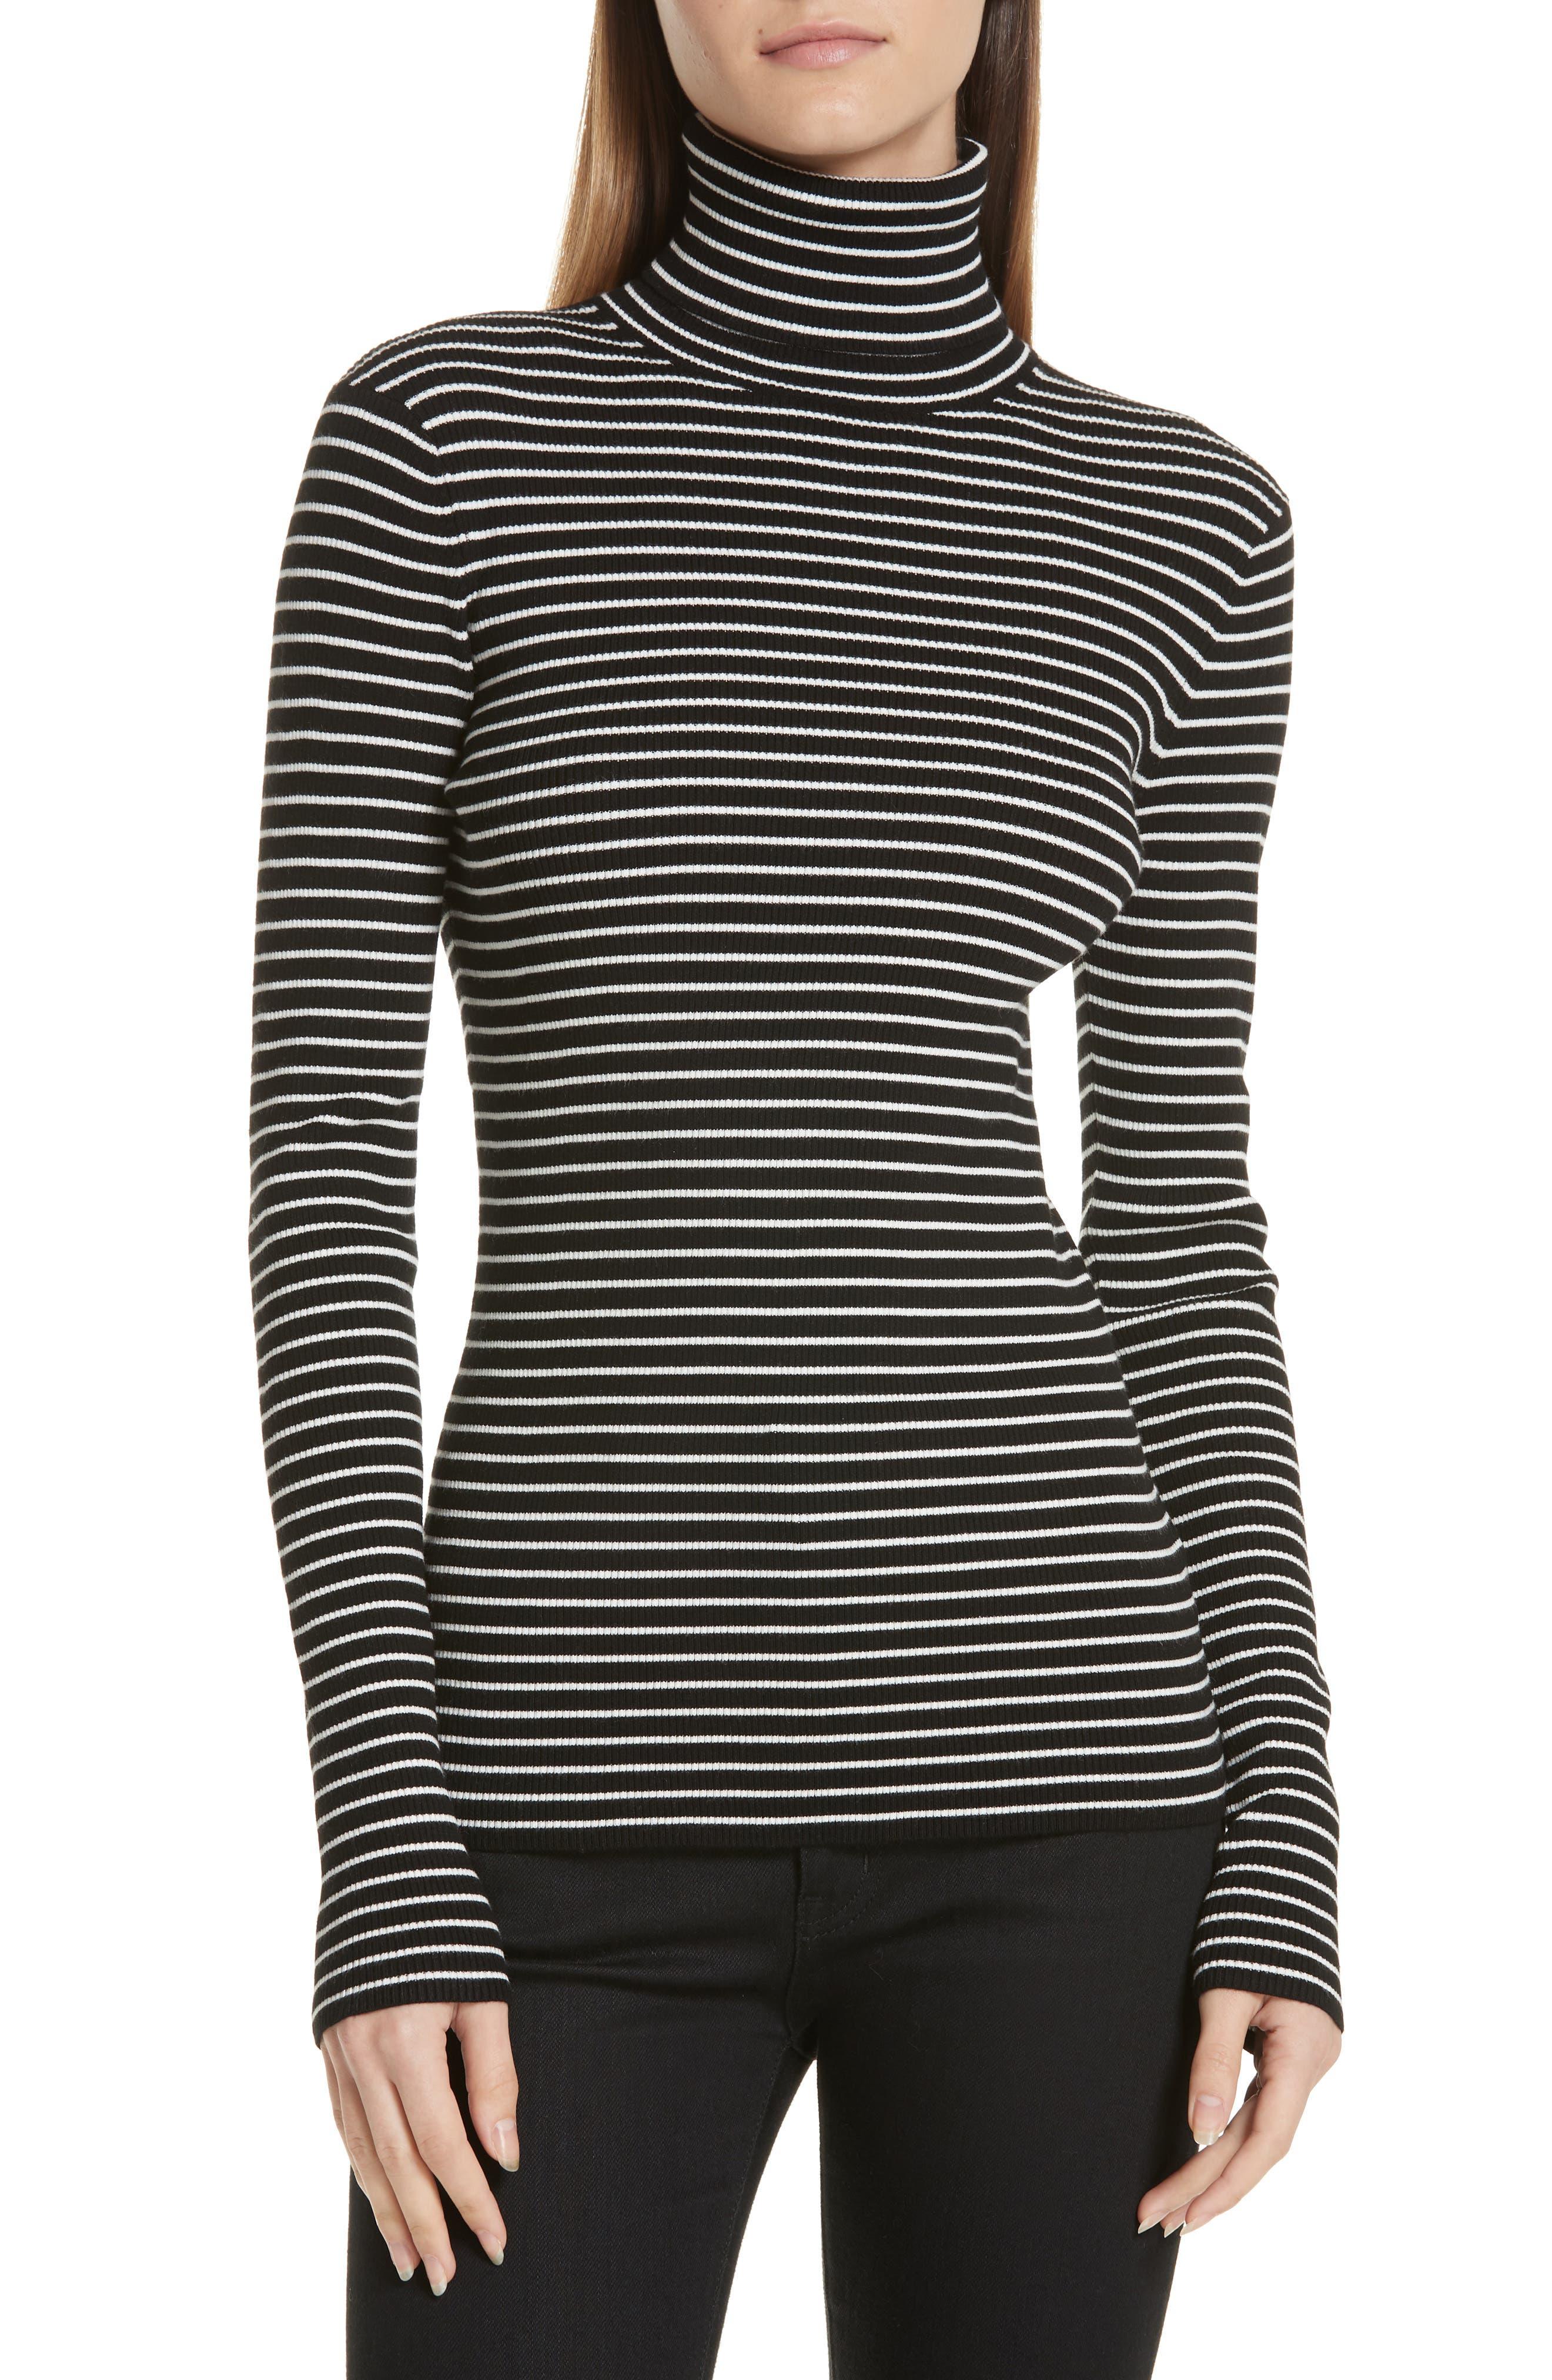 Fine Line Stripe Turtleneck,                         Main,                         color, BLACK AND WHITE STRIPES